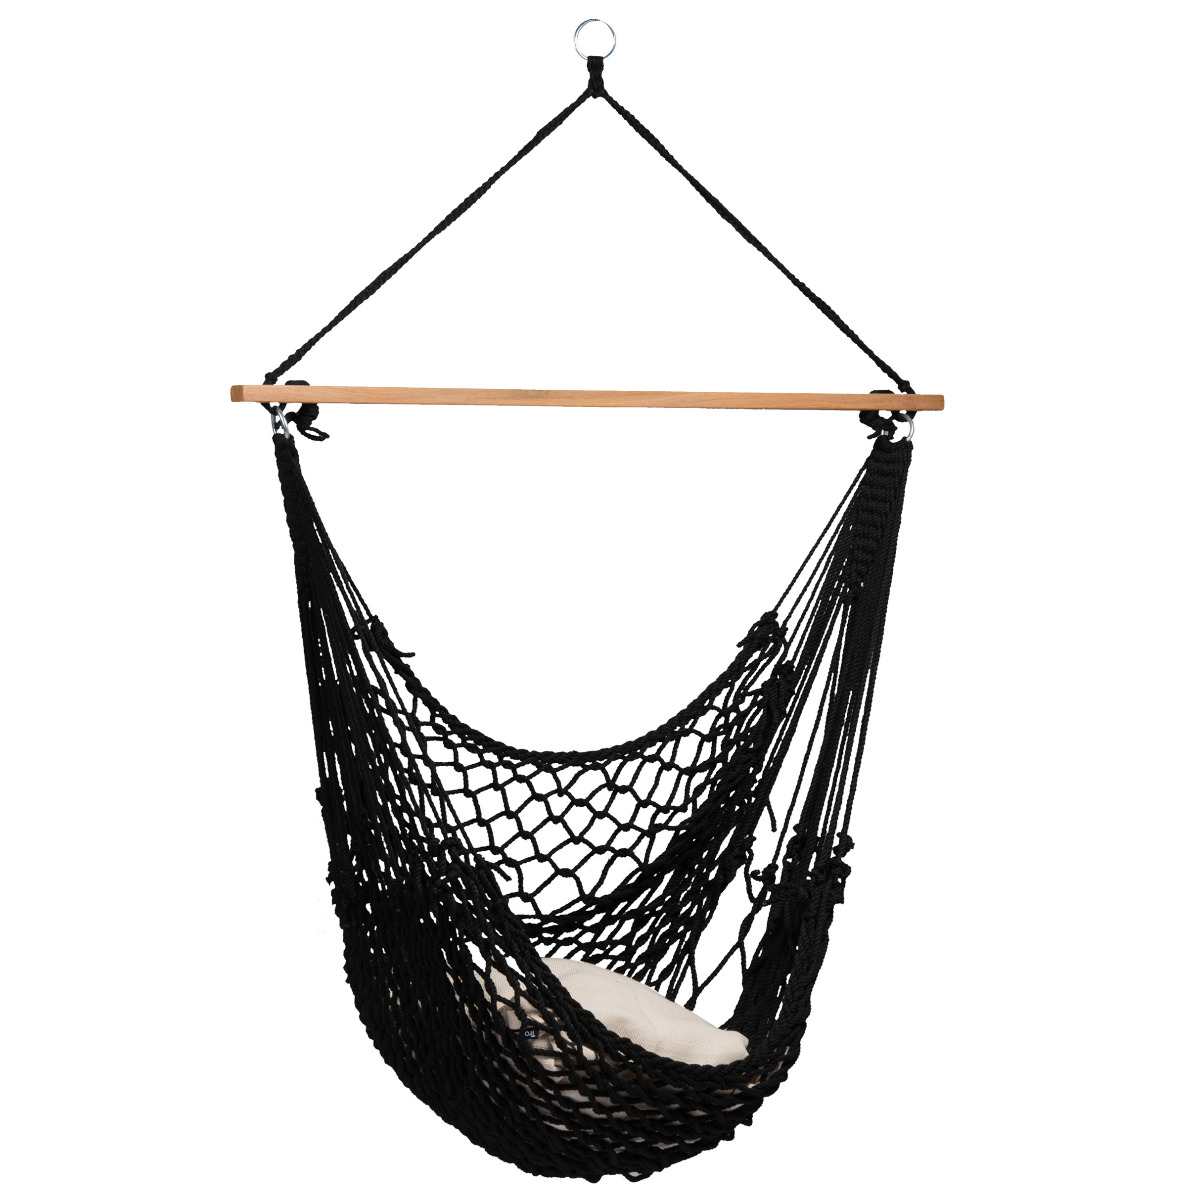 Hangstoel 'Rope' Black - Tropilex �